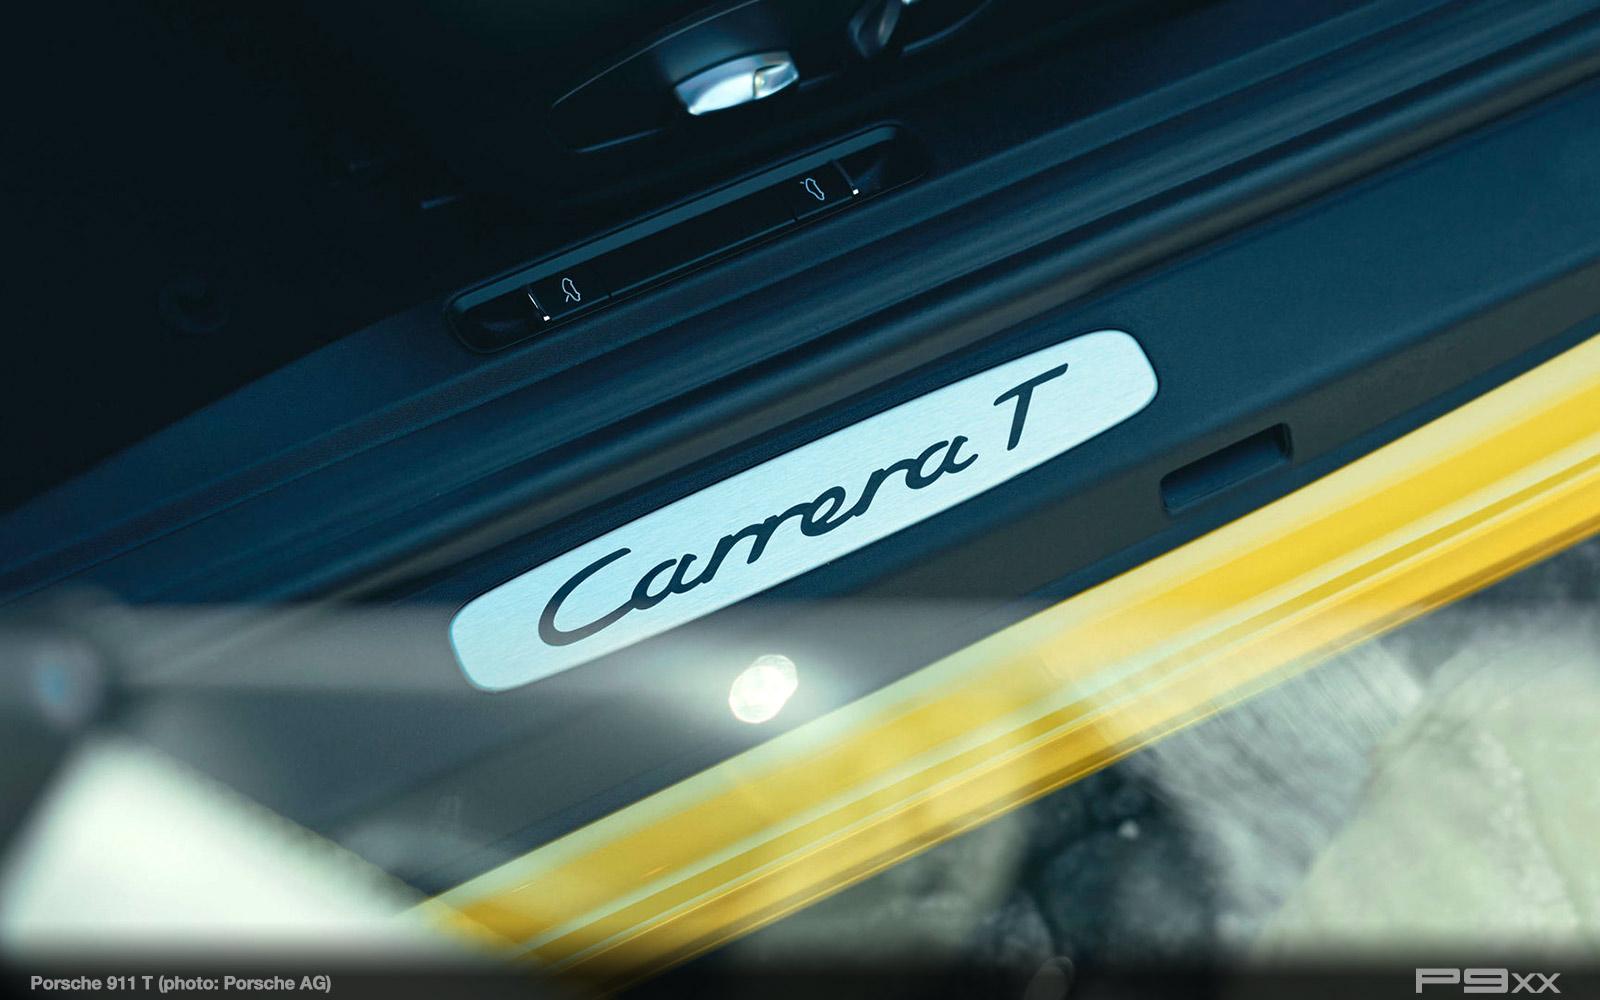 Porsche-911-Carrera-T-323